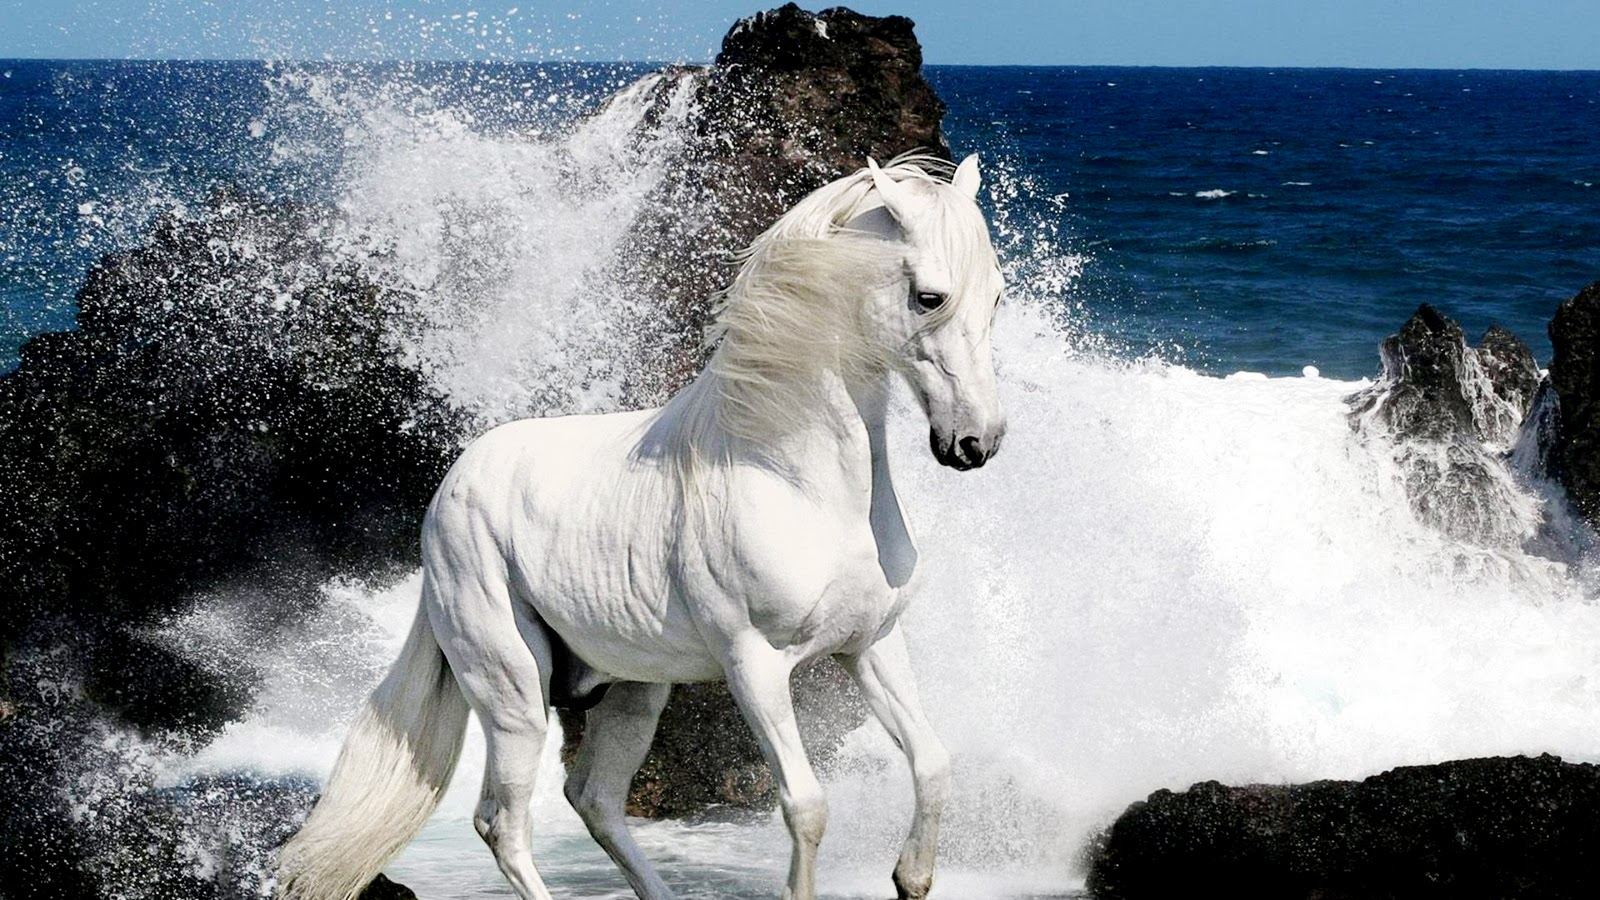 Simple   Wallpaper Horse Ultra Hd - 0614964adff44879ea7059b1c224c9a0  Image_628821.jpg